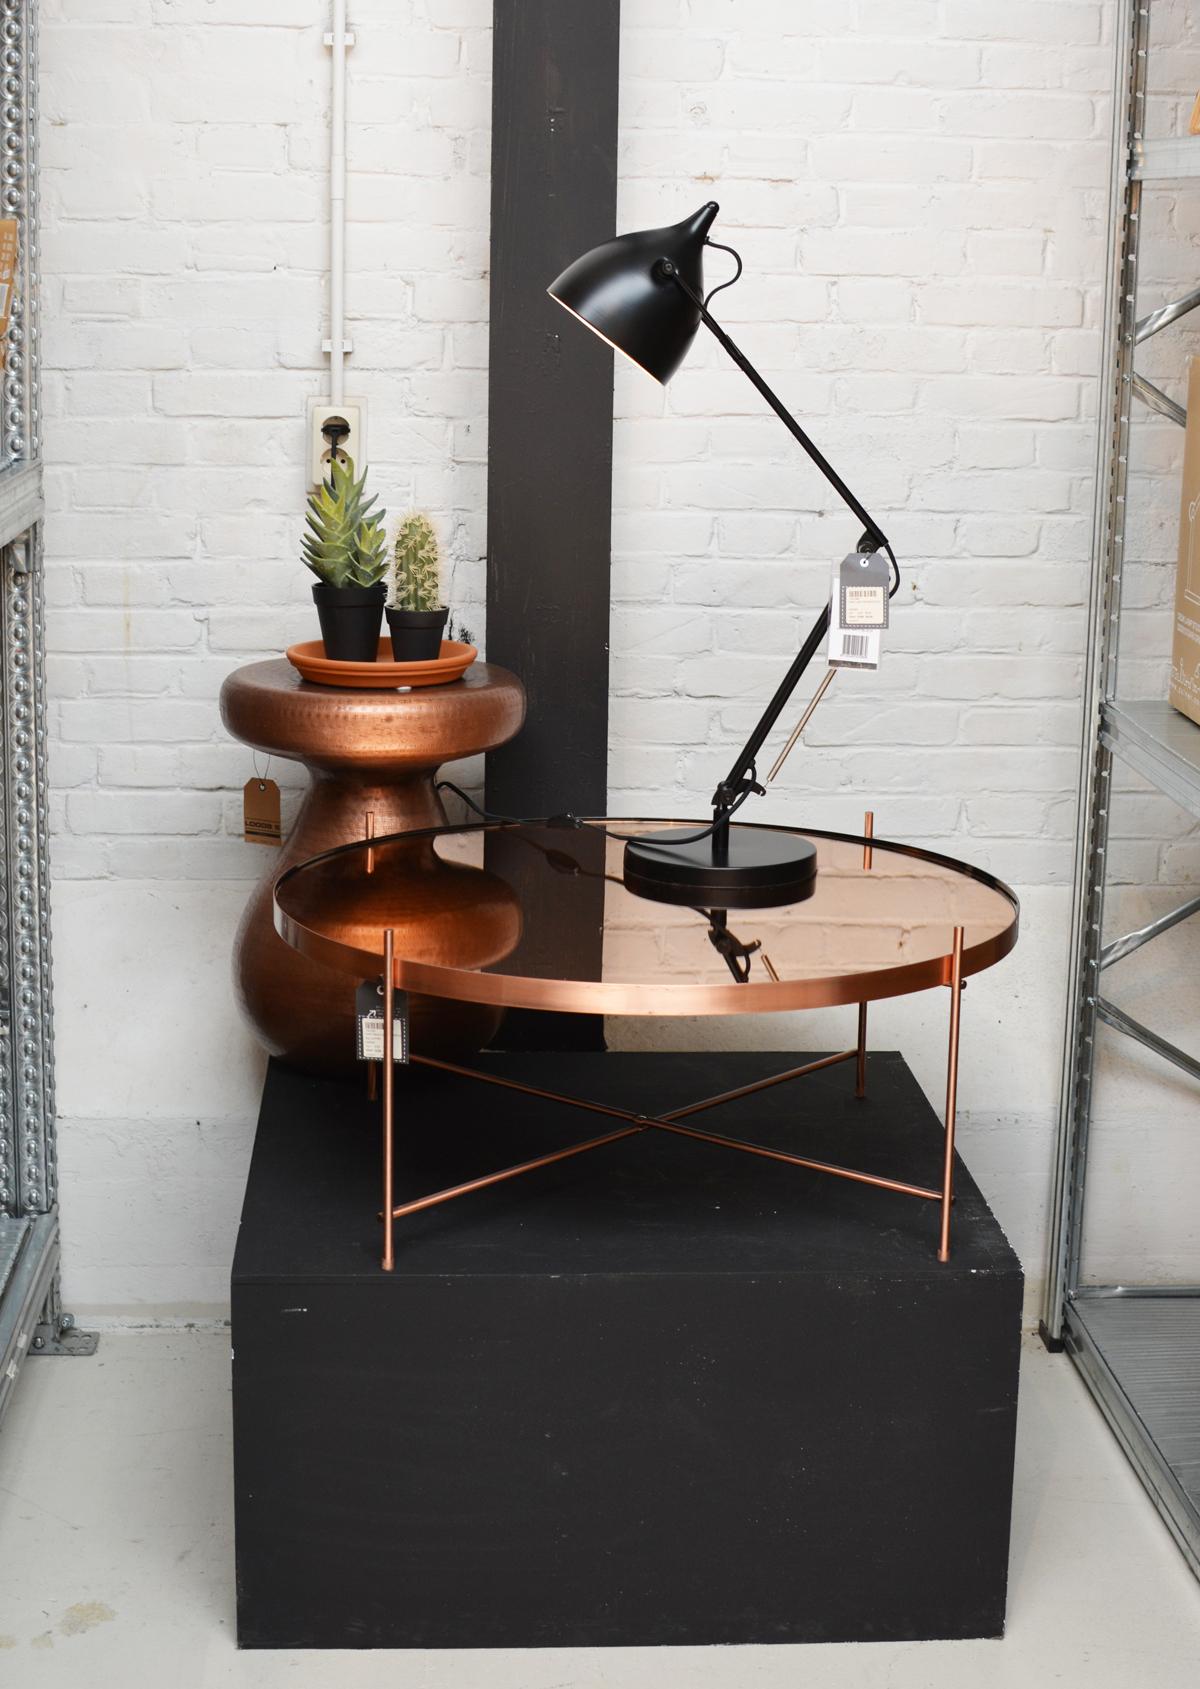 Zuiver tafeltje en lamp